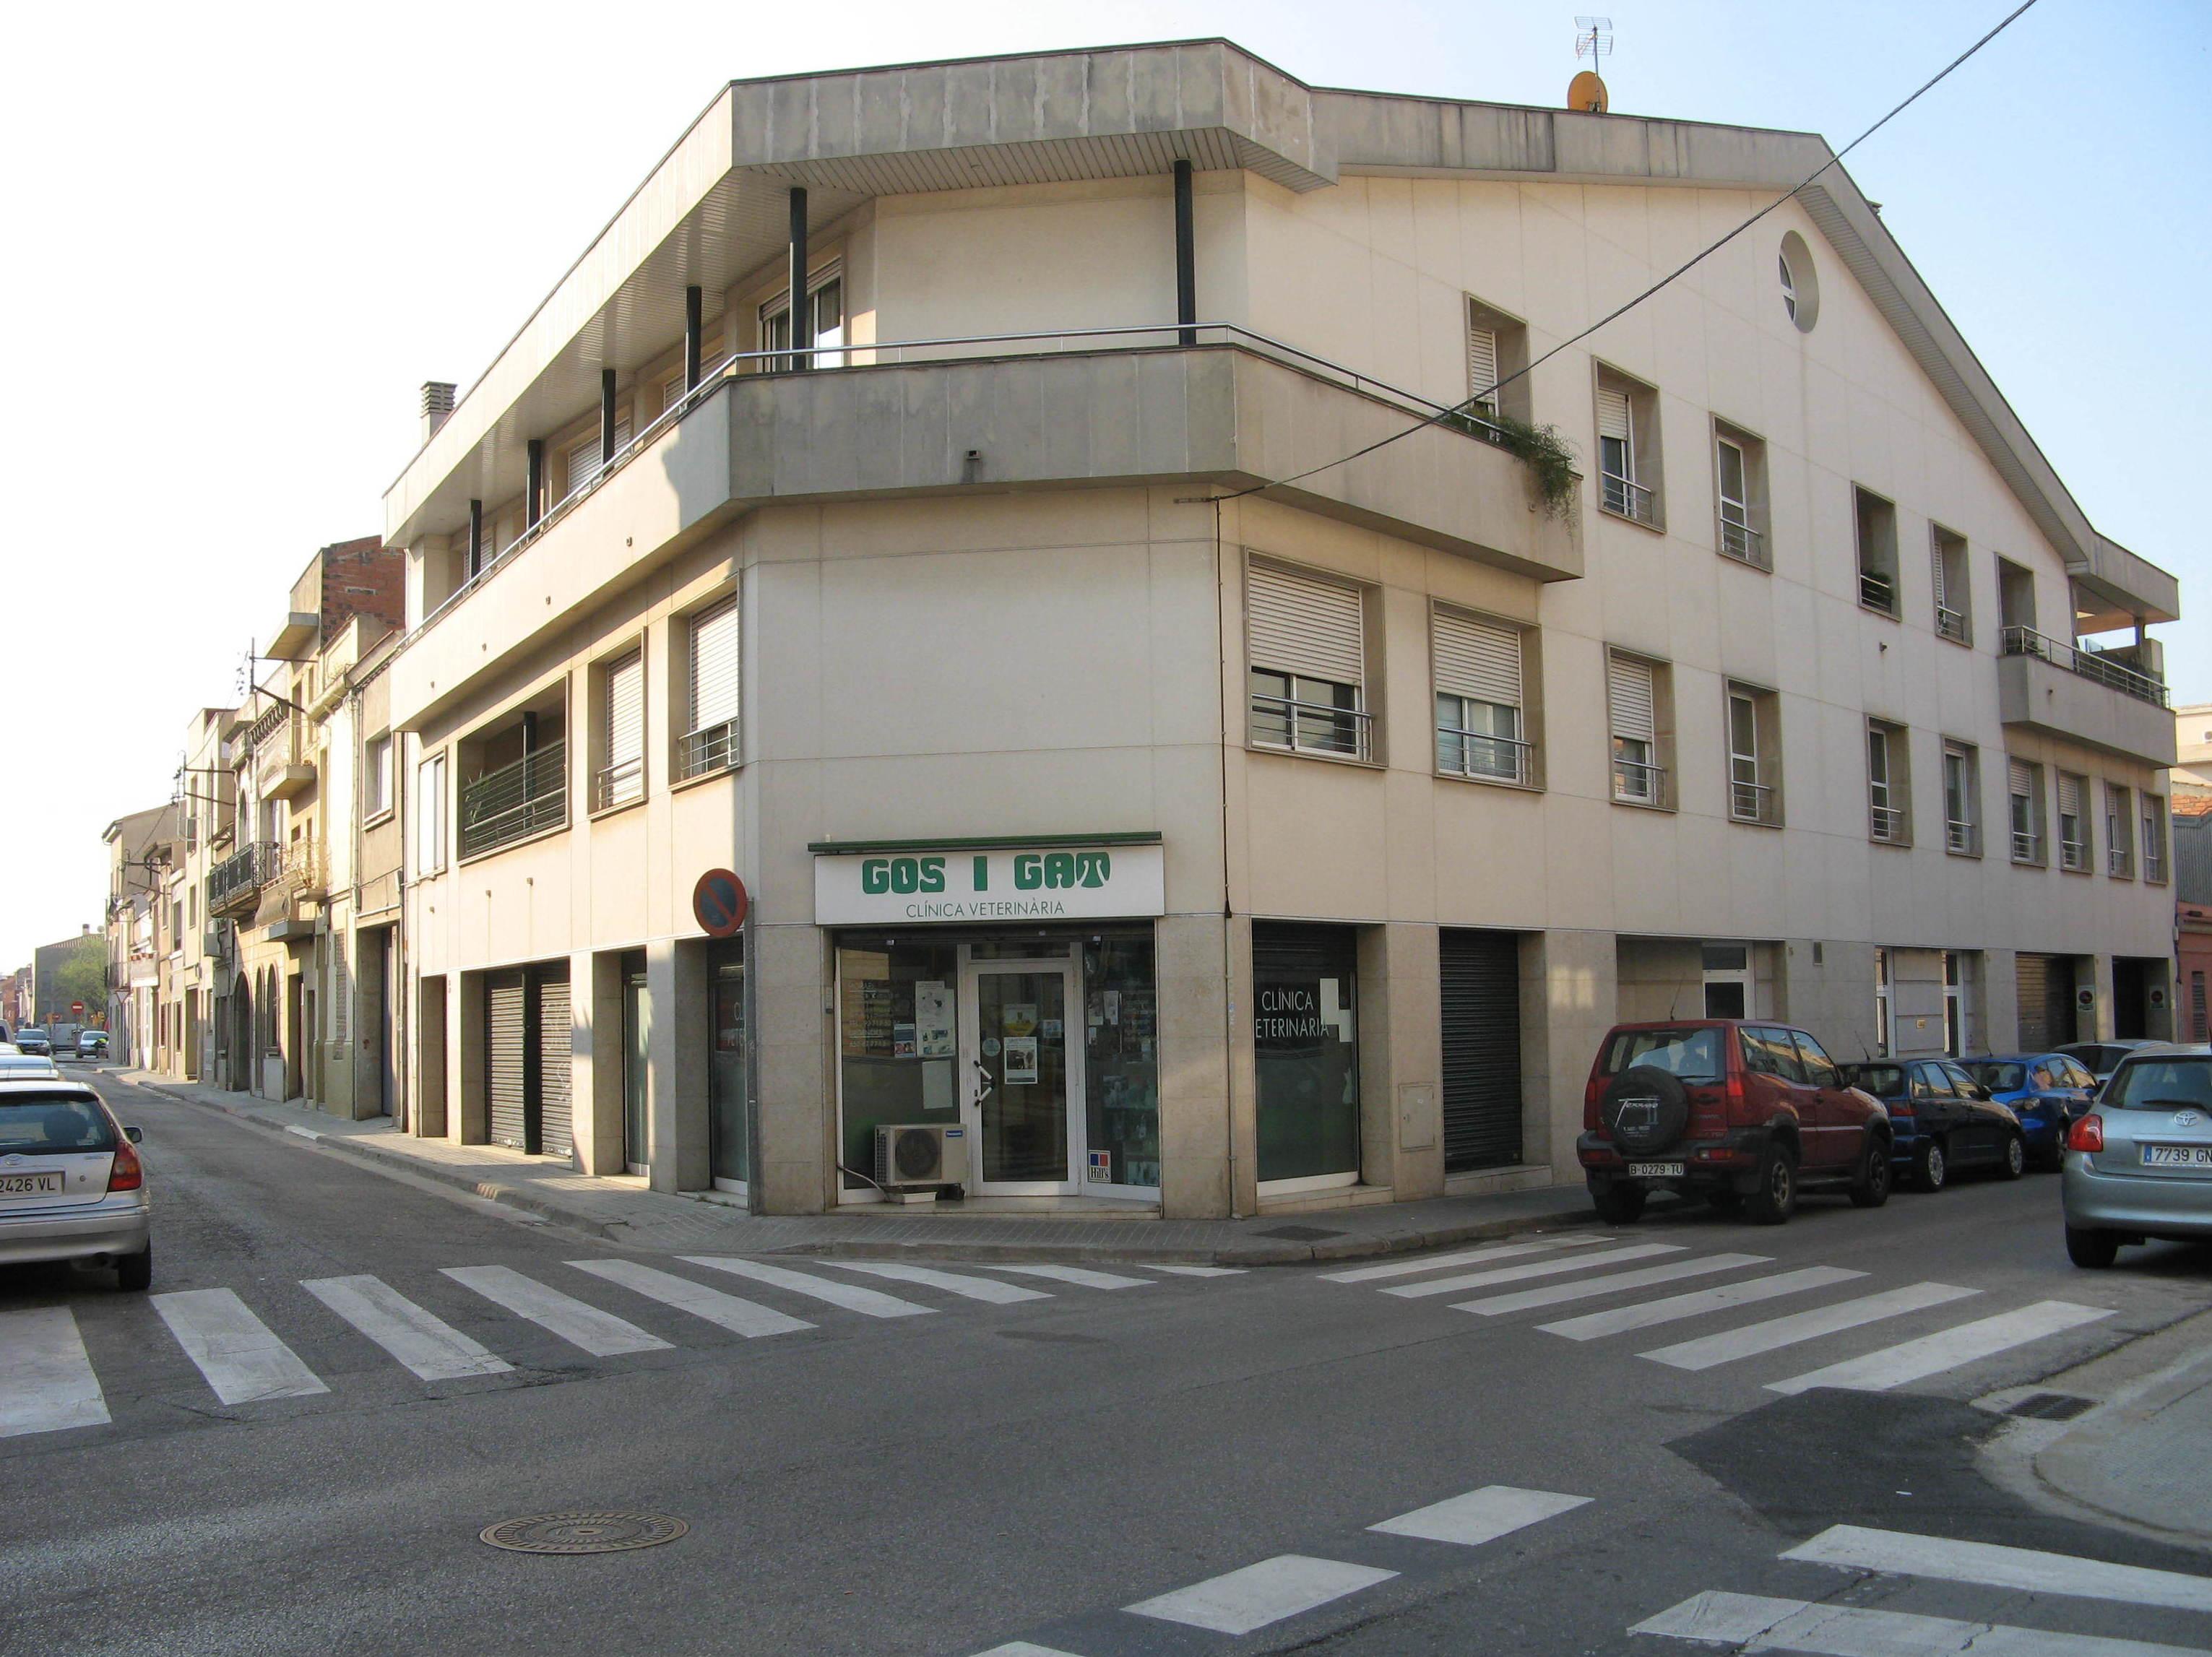 Foto 7 de Clínica veterinaria en Sabadell | Gos i Gat clínica veterinària sl